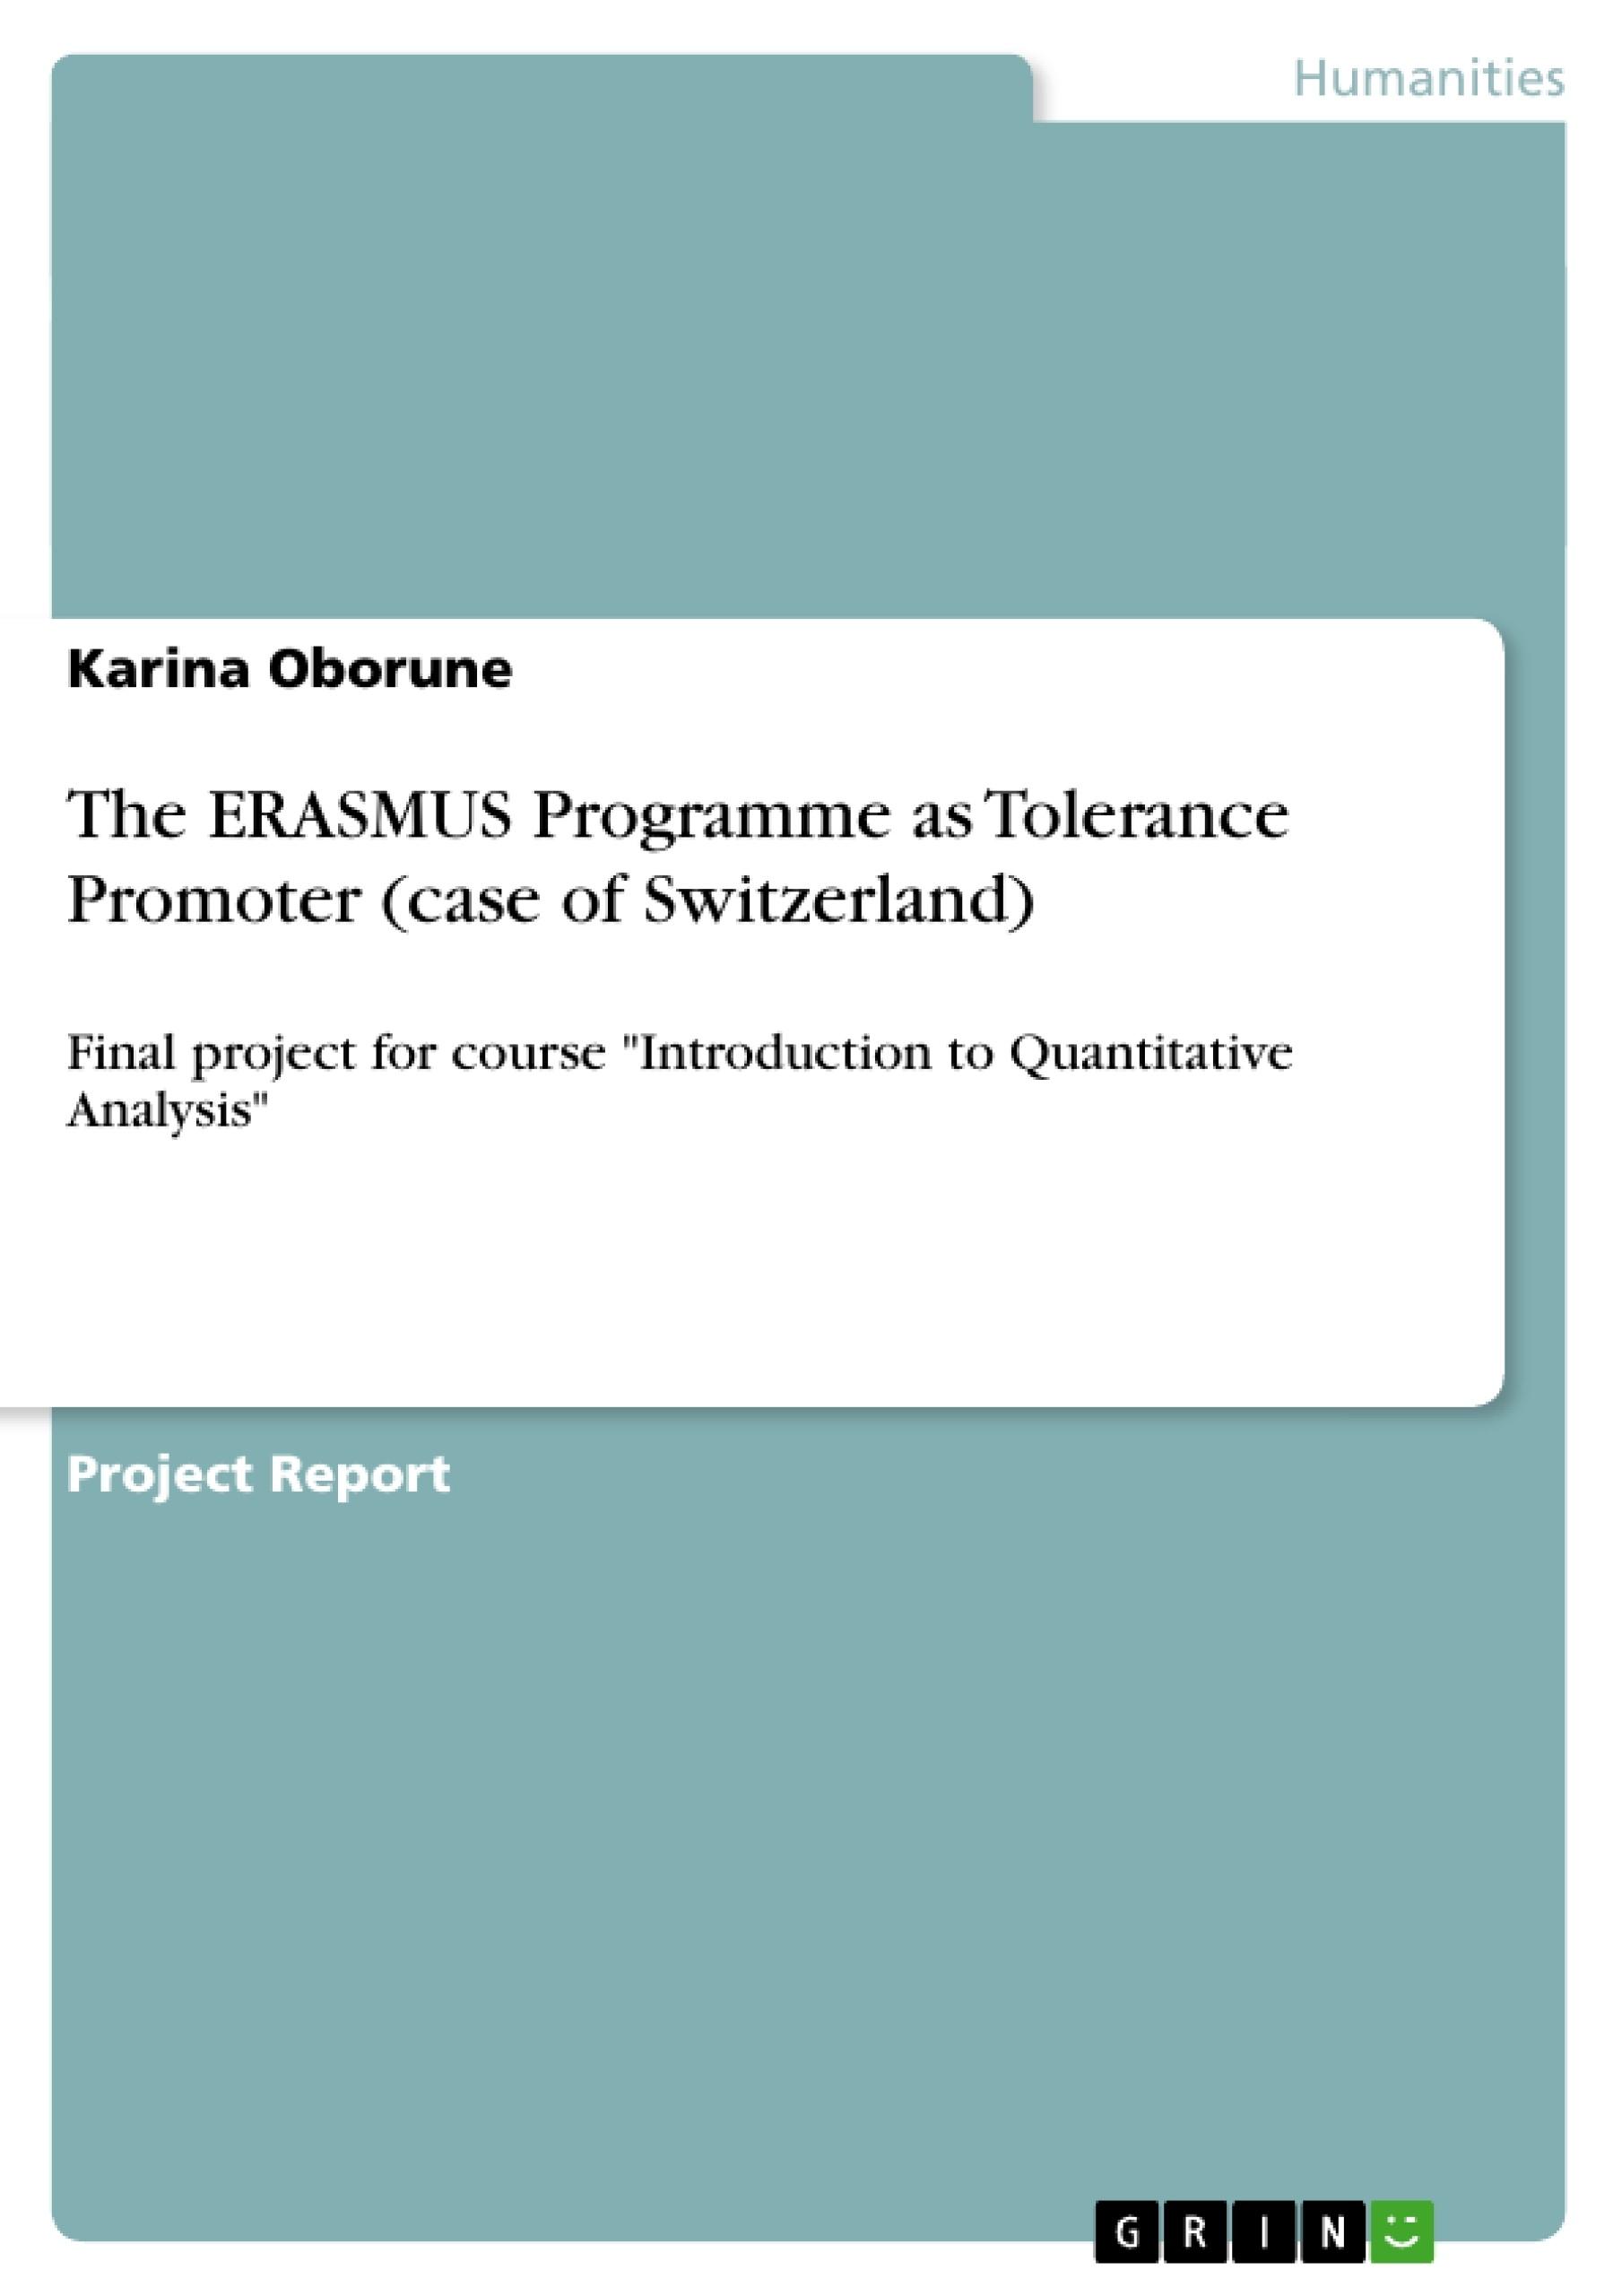 Title: The ERASMUS Programme as Tolerance Promoter (case of Switzerland)